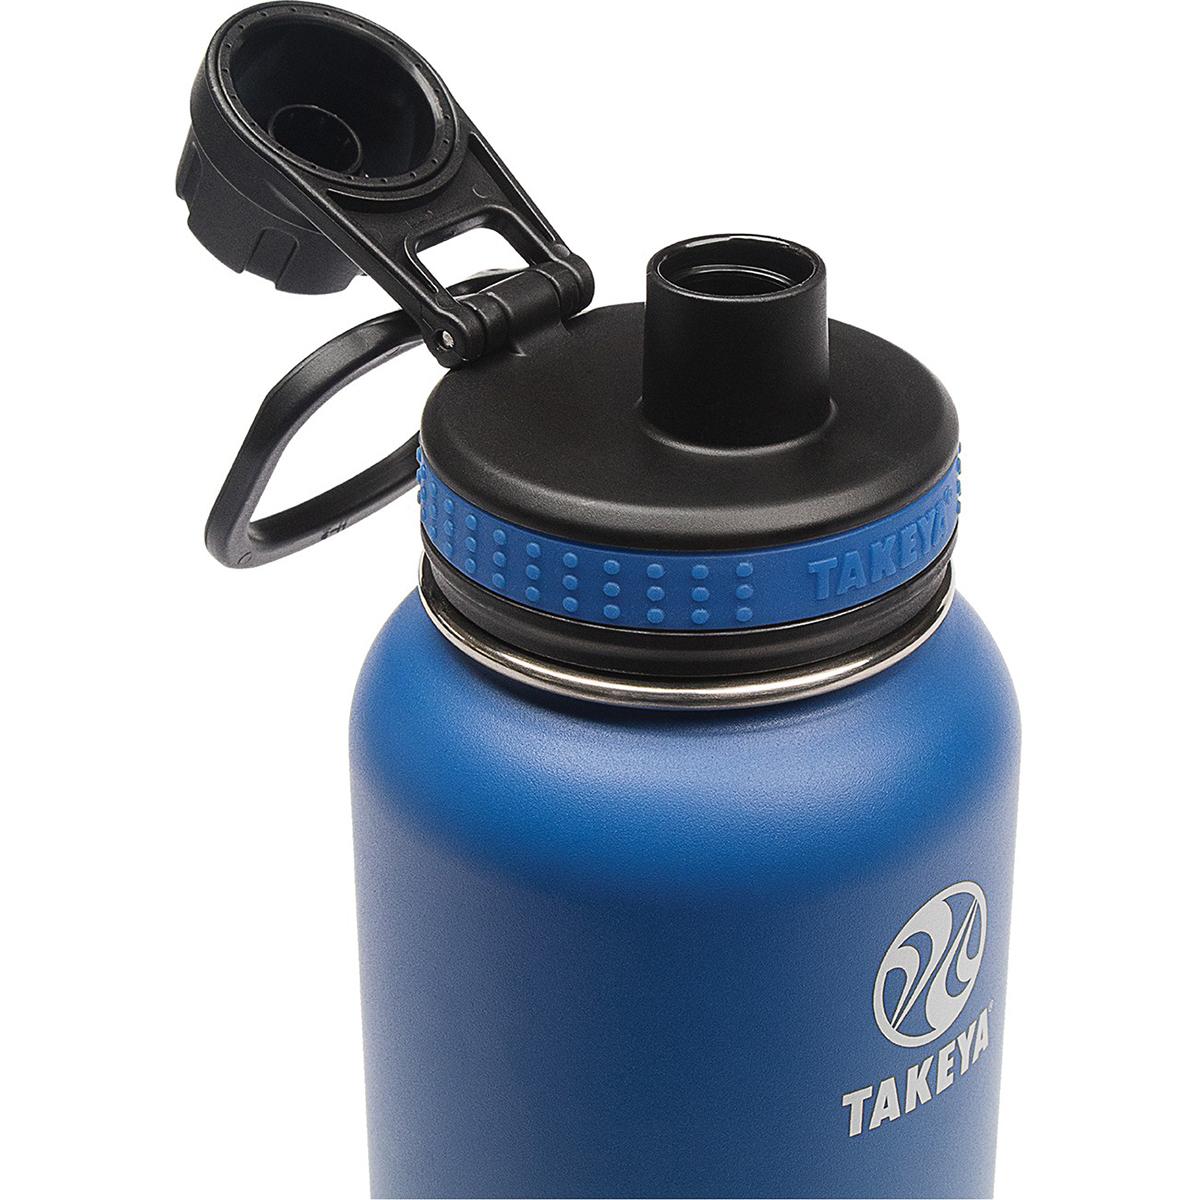 Takeya-Originals-32-oz-Insulated-Stainless-Steel-Water-Bottle thumbnail 11